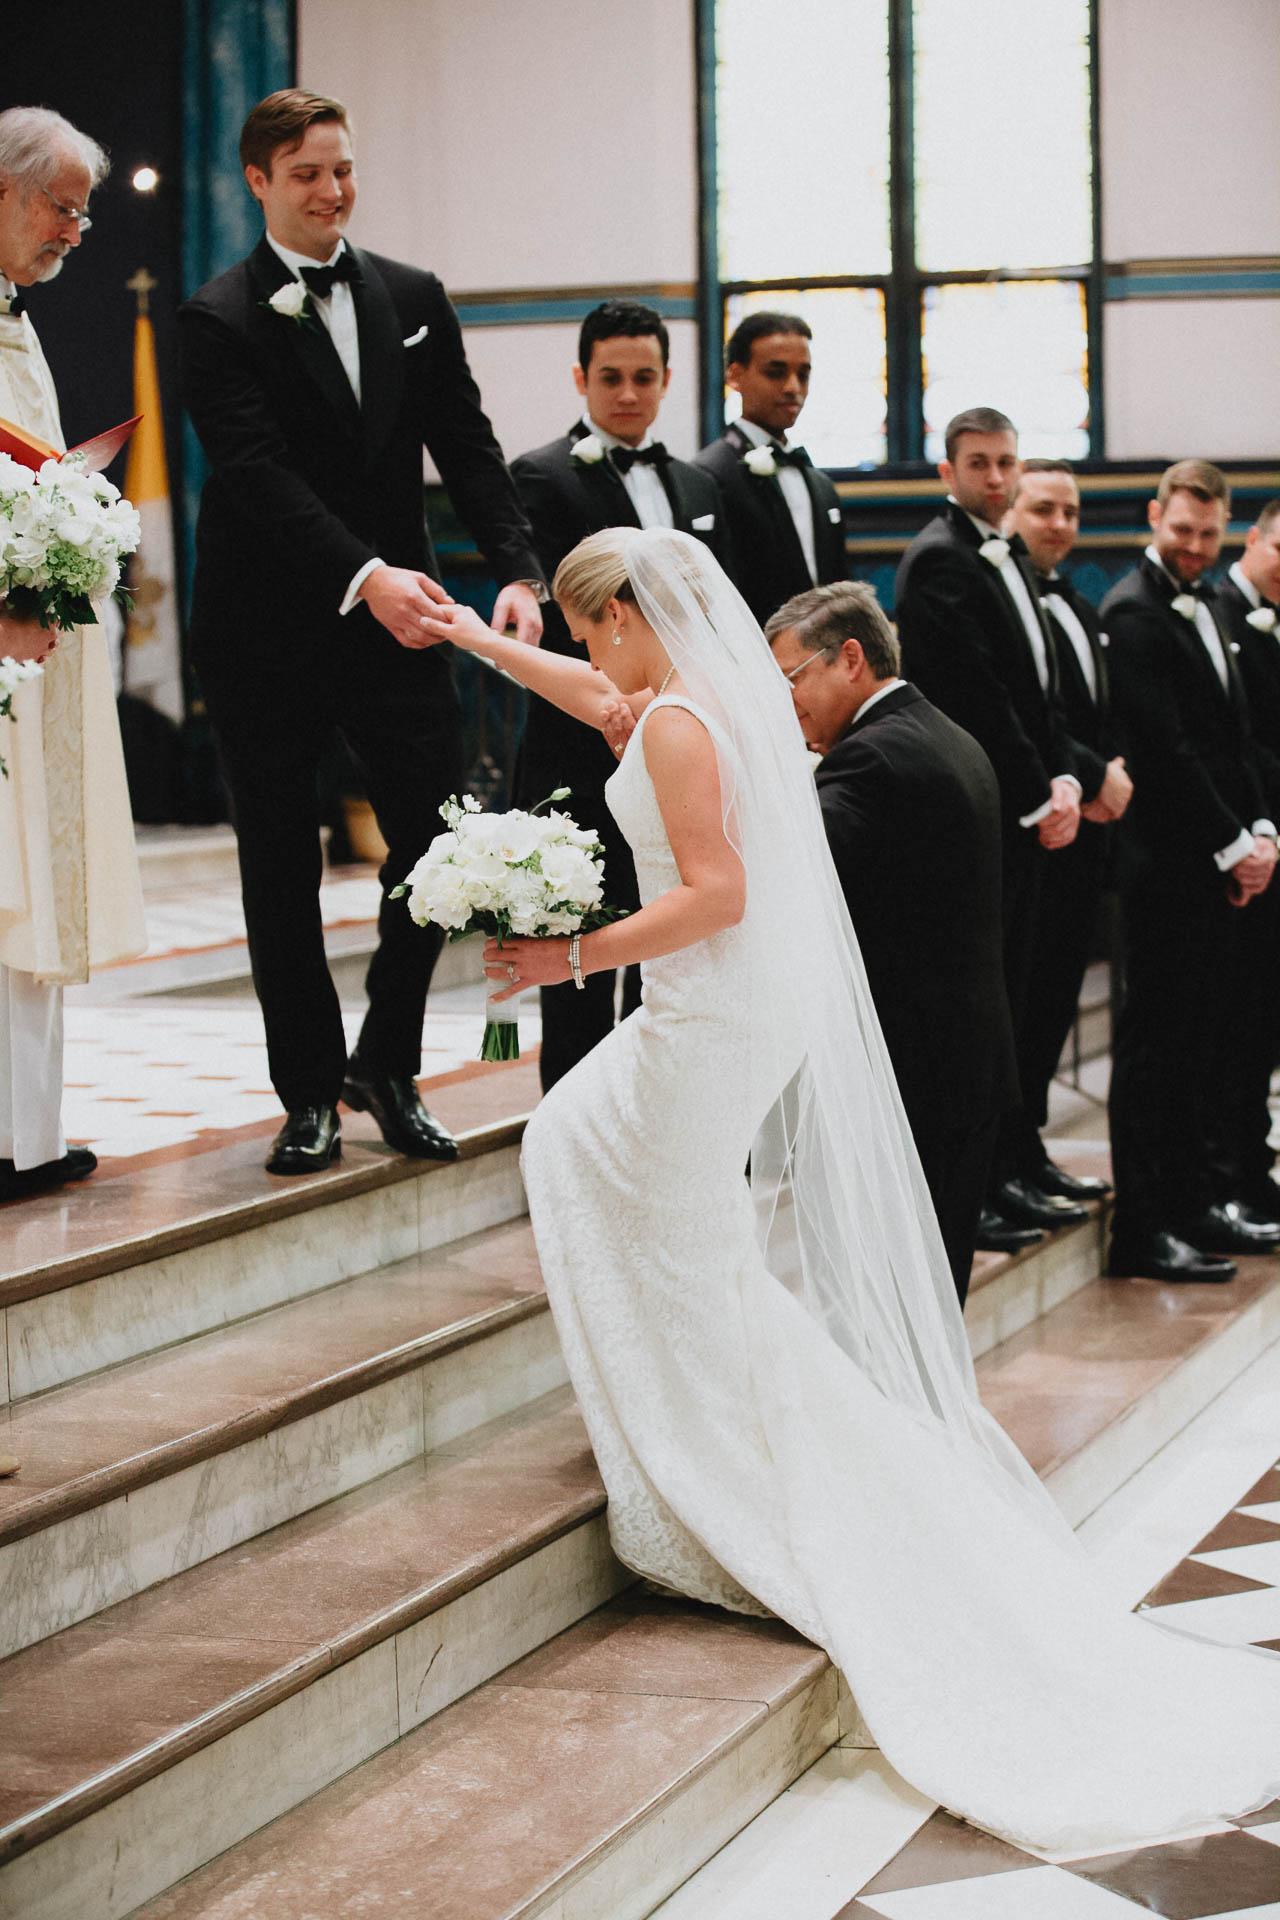 Cincinnati-Contemporary-Arts-Center-Wedding-019.jpg